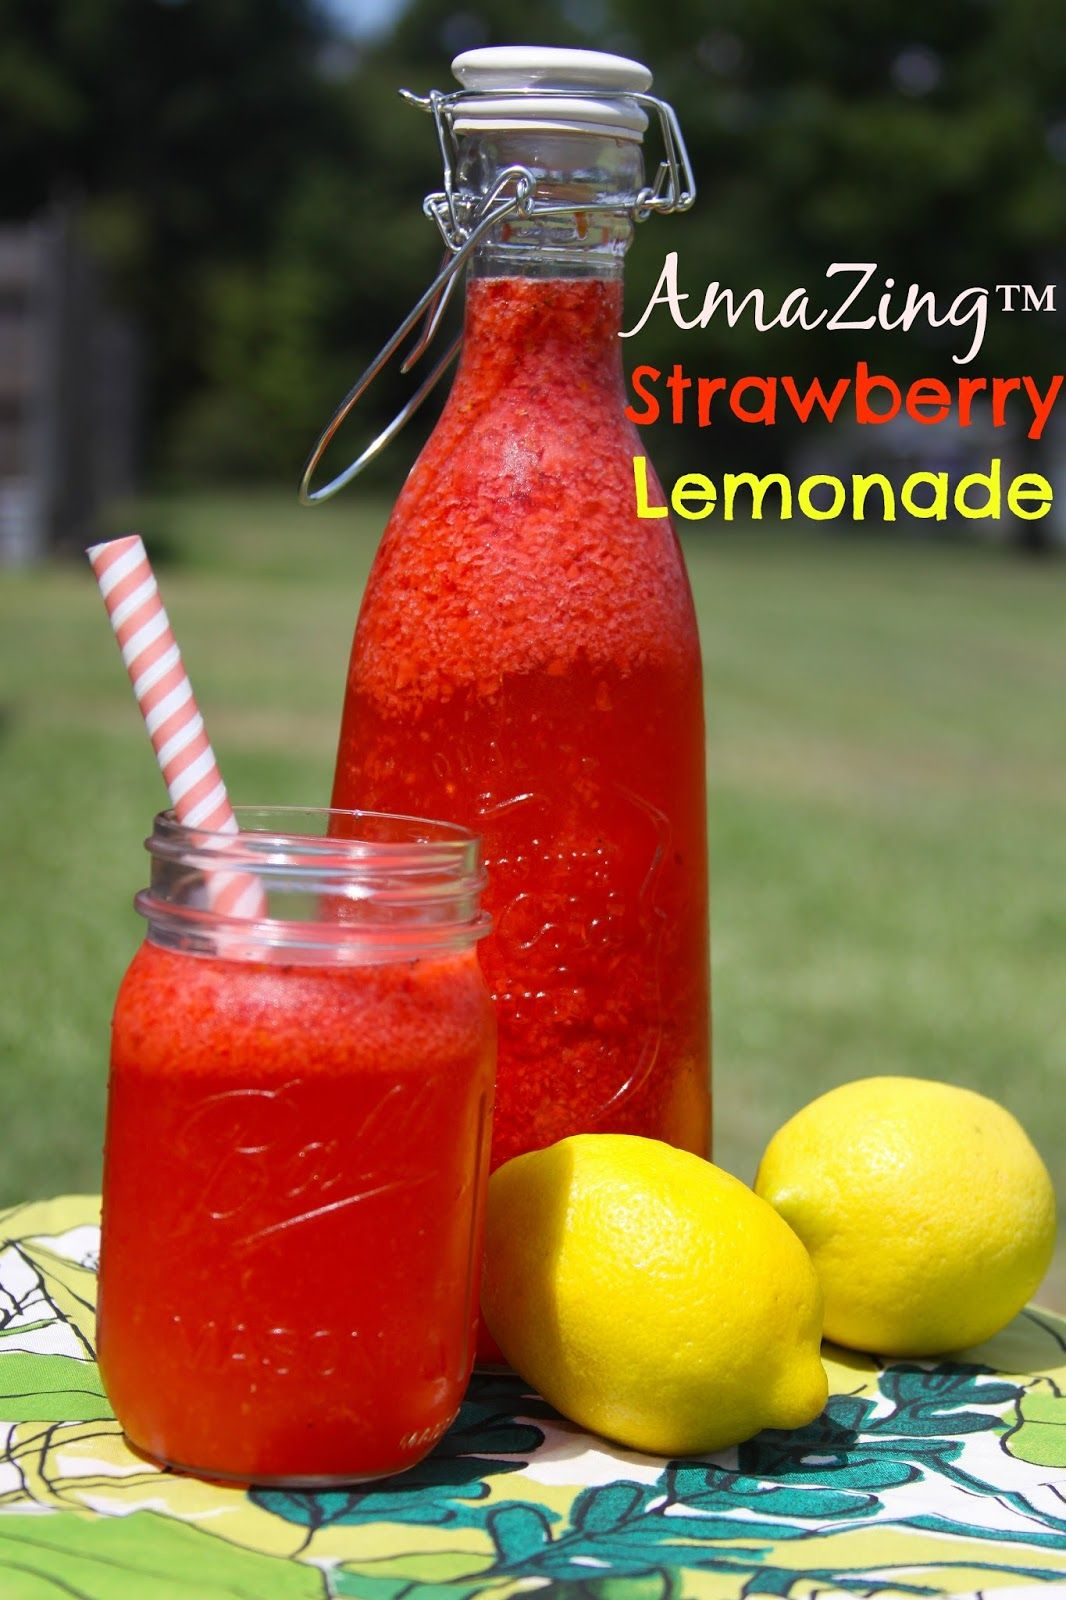 AmaZing™ Strawberry Lemonade | FOOD | Pinterest